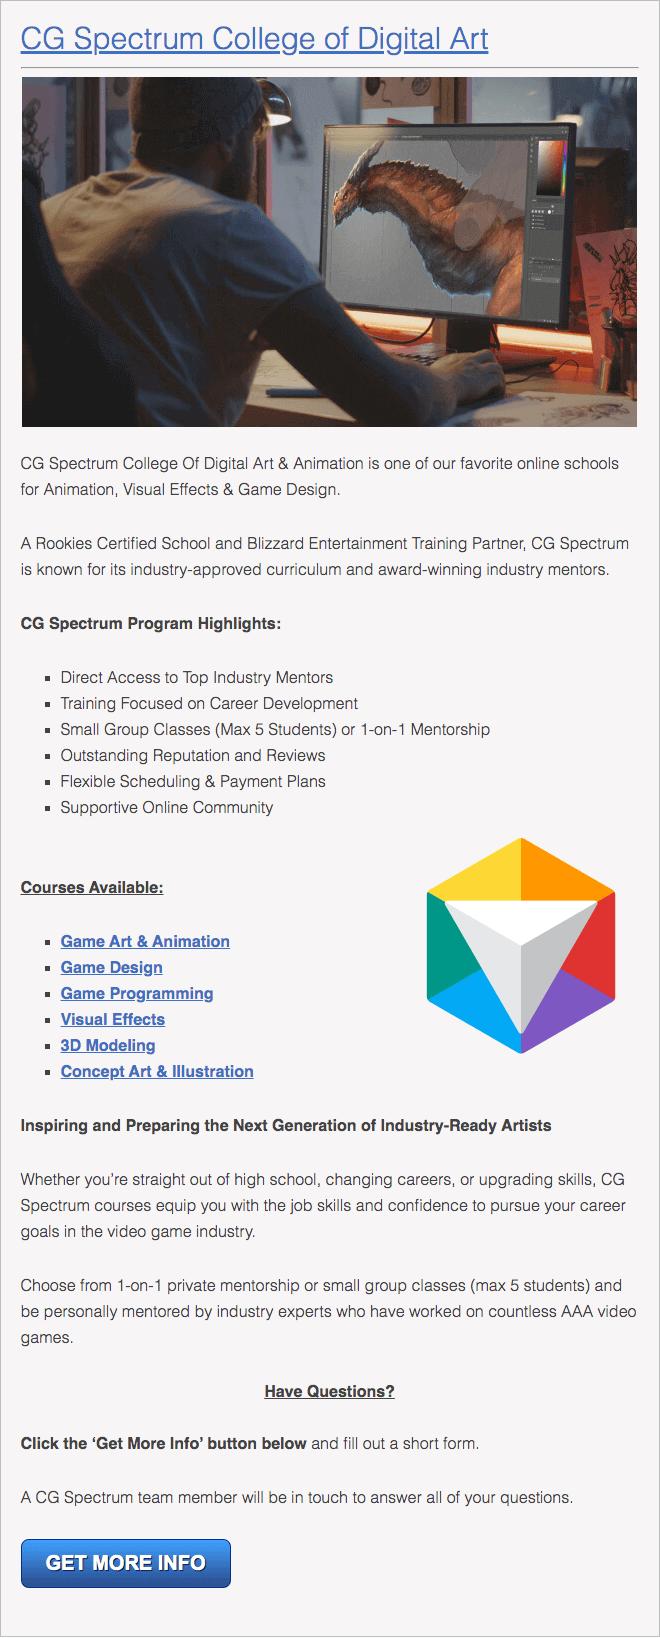 New Jersey Digital Arts and Animation School